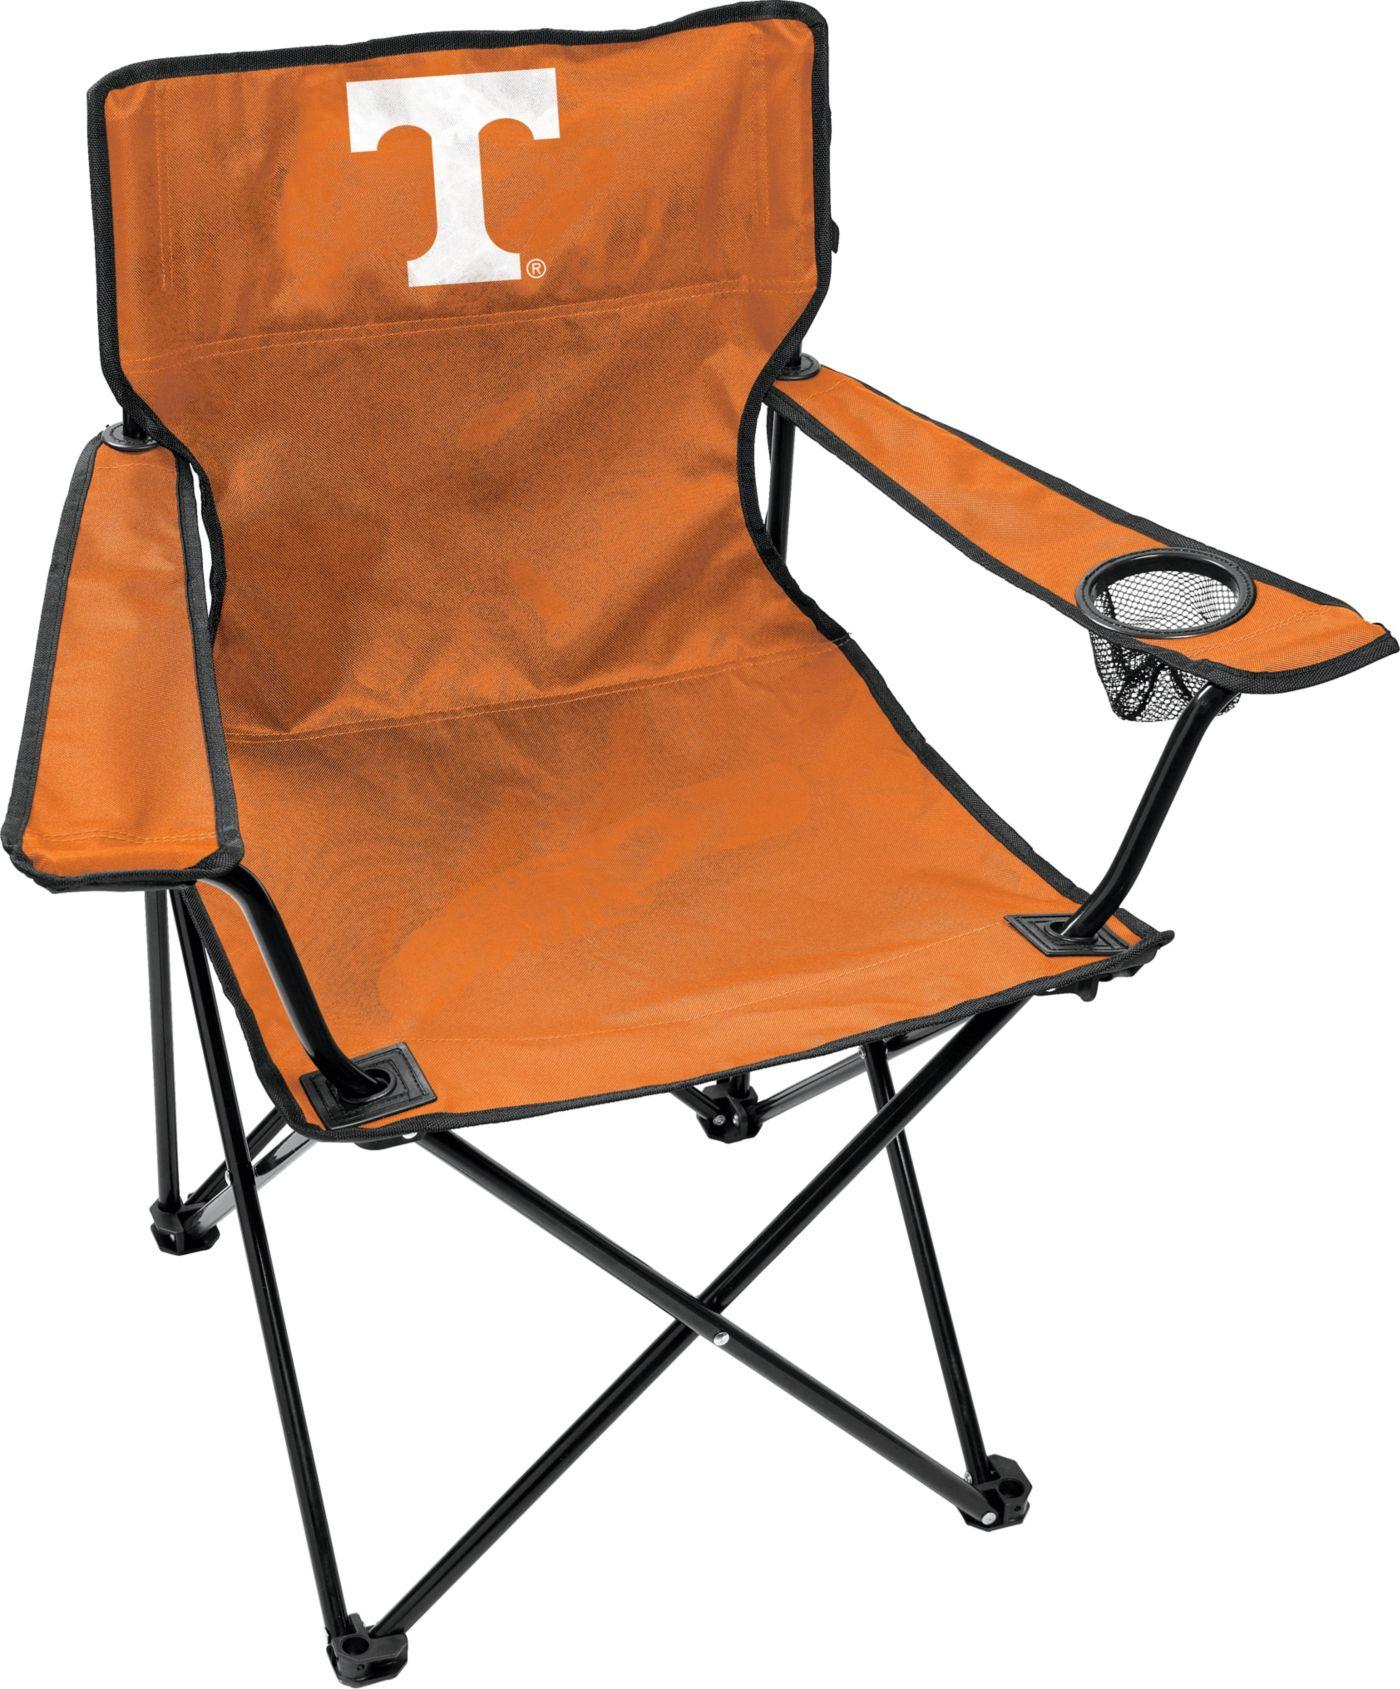 Rawlings Tennessee Volunteers Game Changer Chair